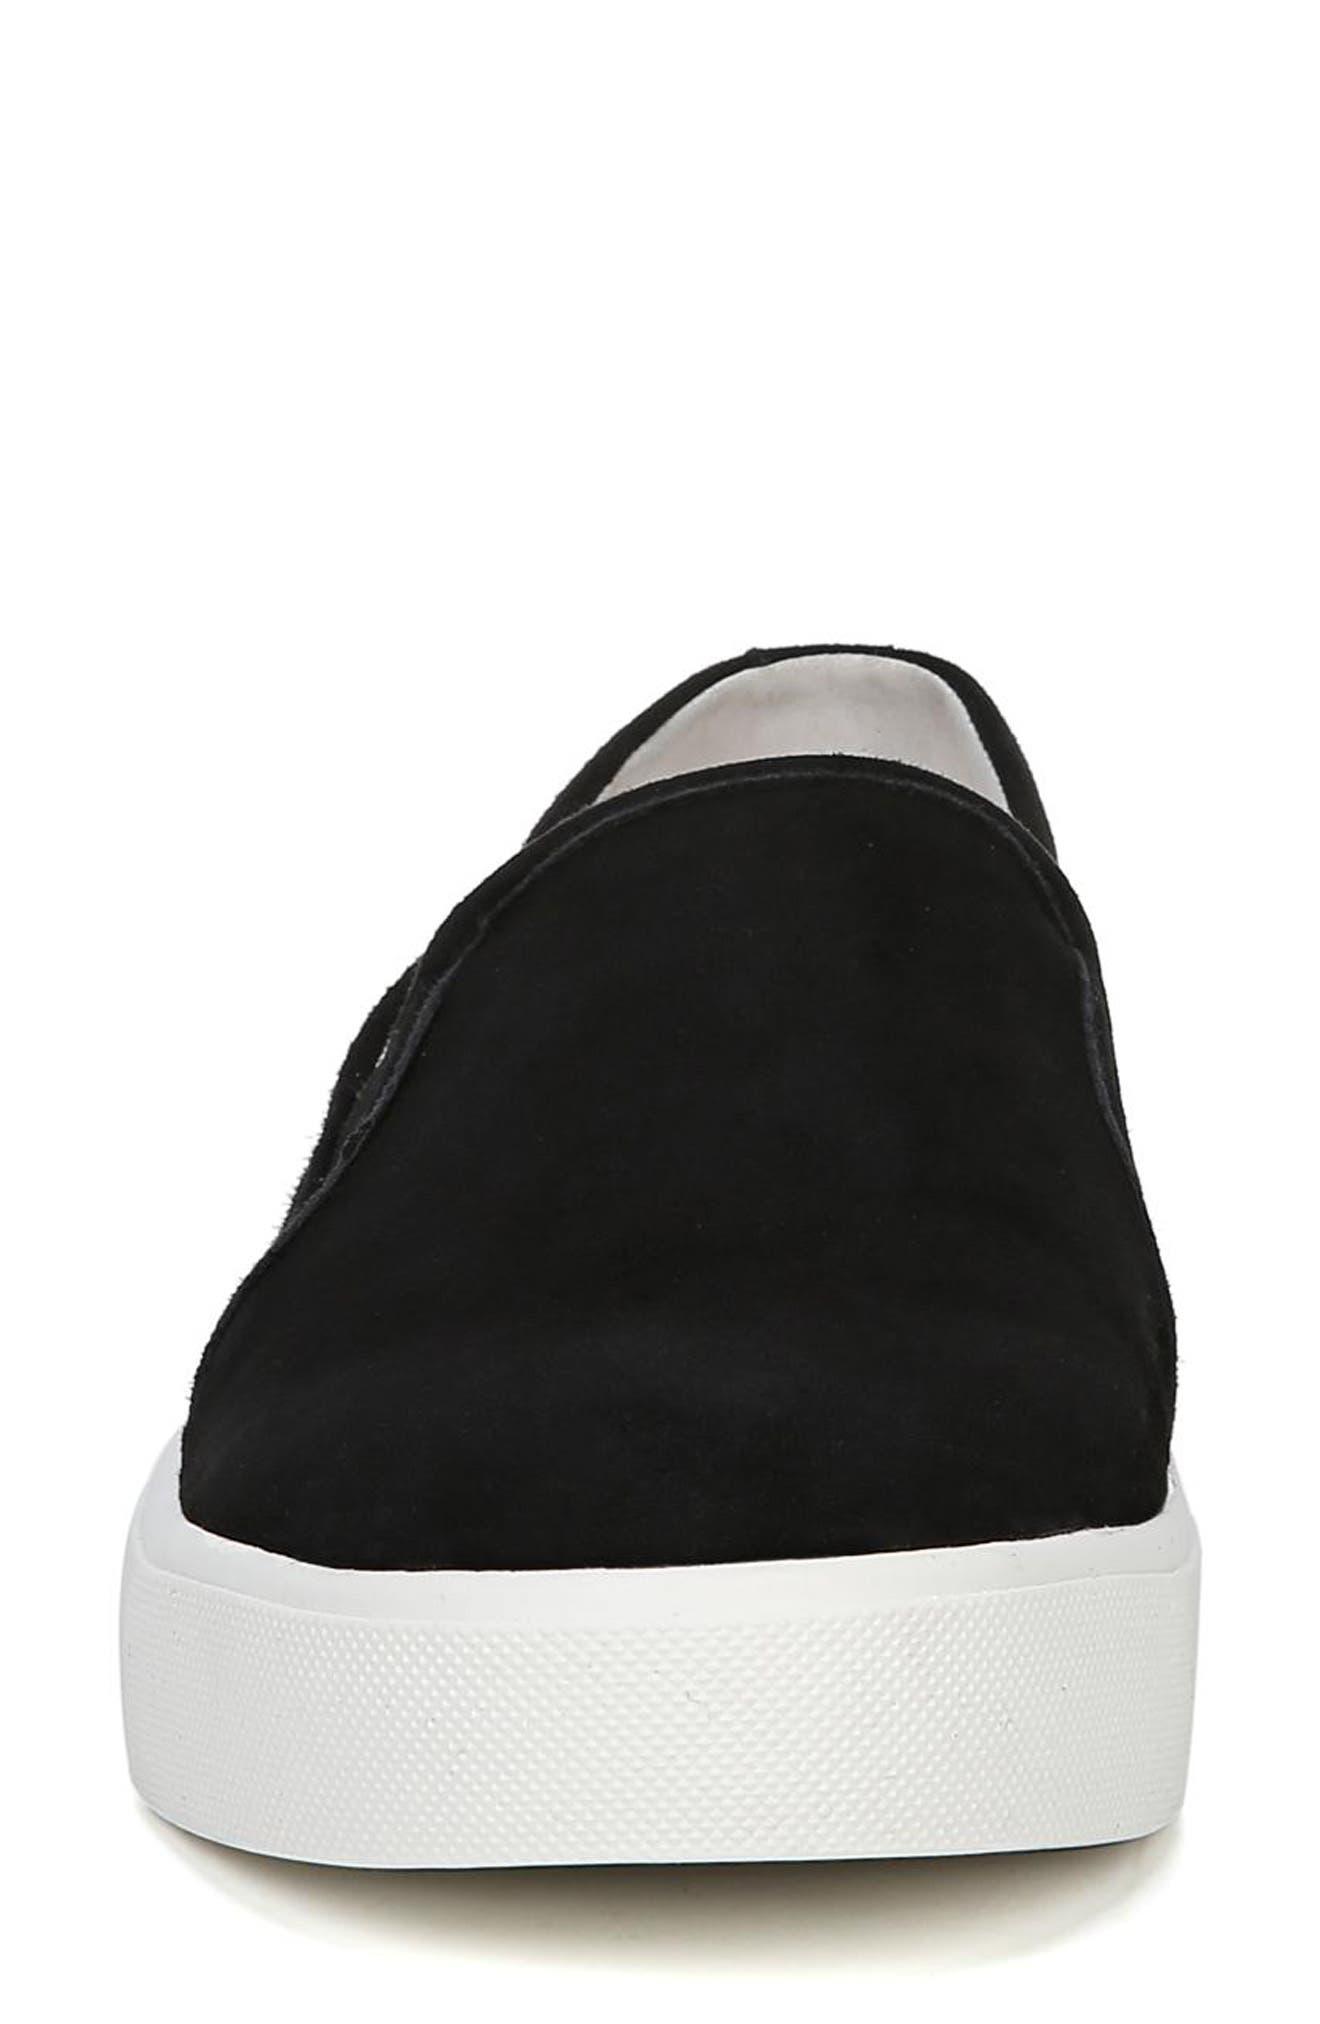 Elton Slip-On Sneaker,                             Alternate thumbnail 4, color,                             BLACK SUEDE LEATHER